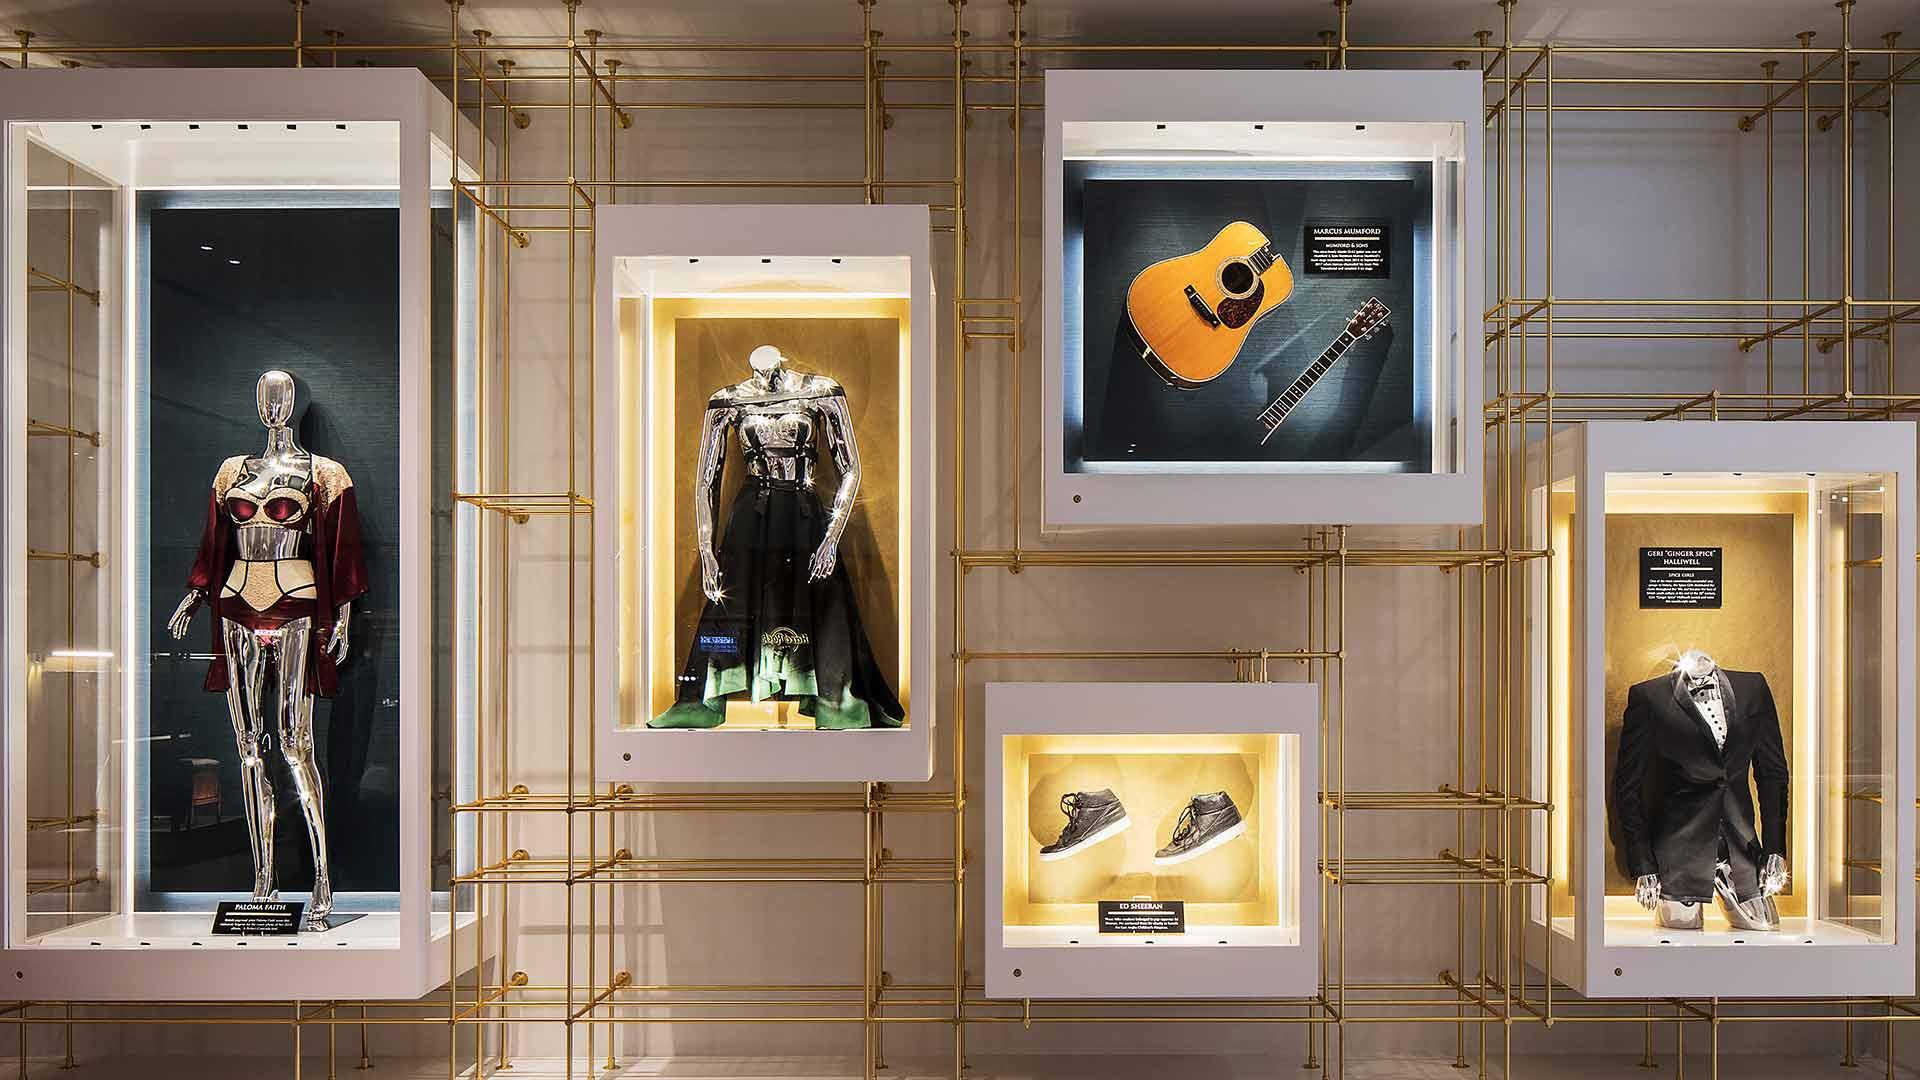 Lighting Design Illuminated Wall Mounted Display Cases Music Memorabilia Ed Sheeran Geri Halliwell Hard Rock Hotel Nulty